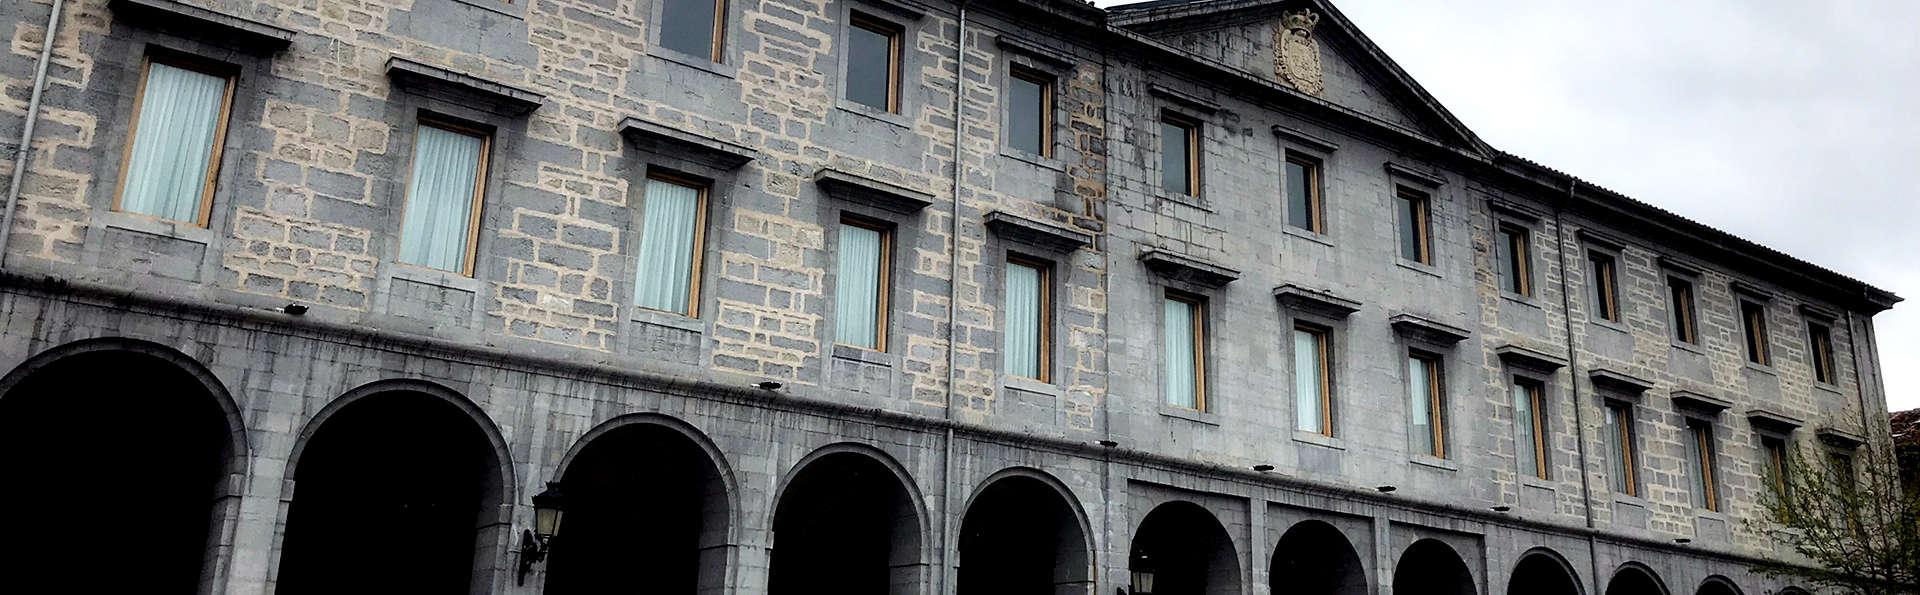 Hotel Balneario Orduña Plaza - Edit_Front2.jpg